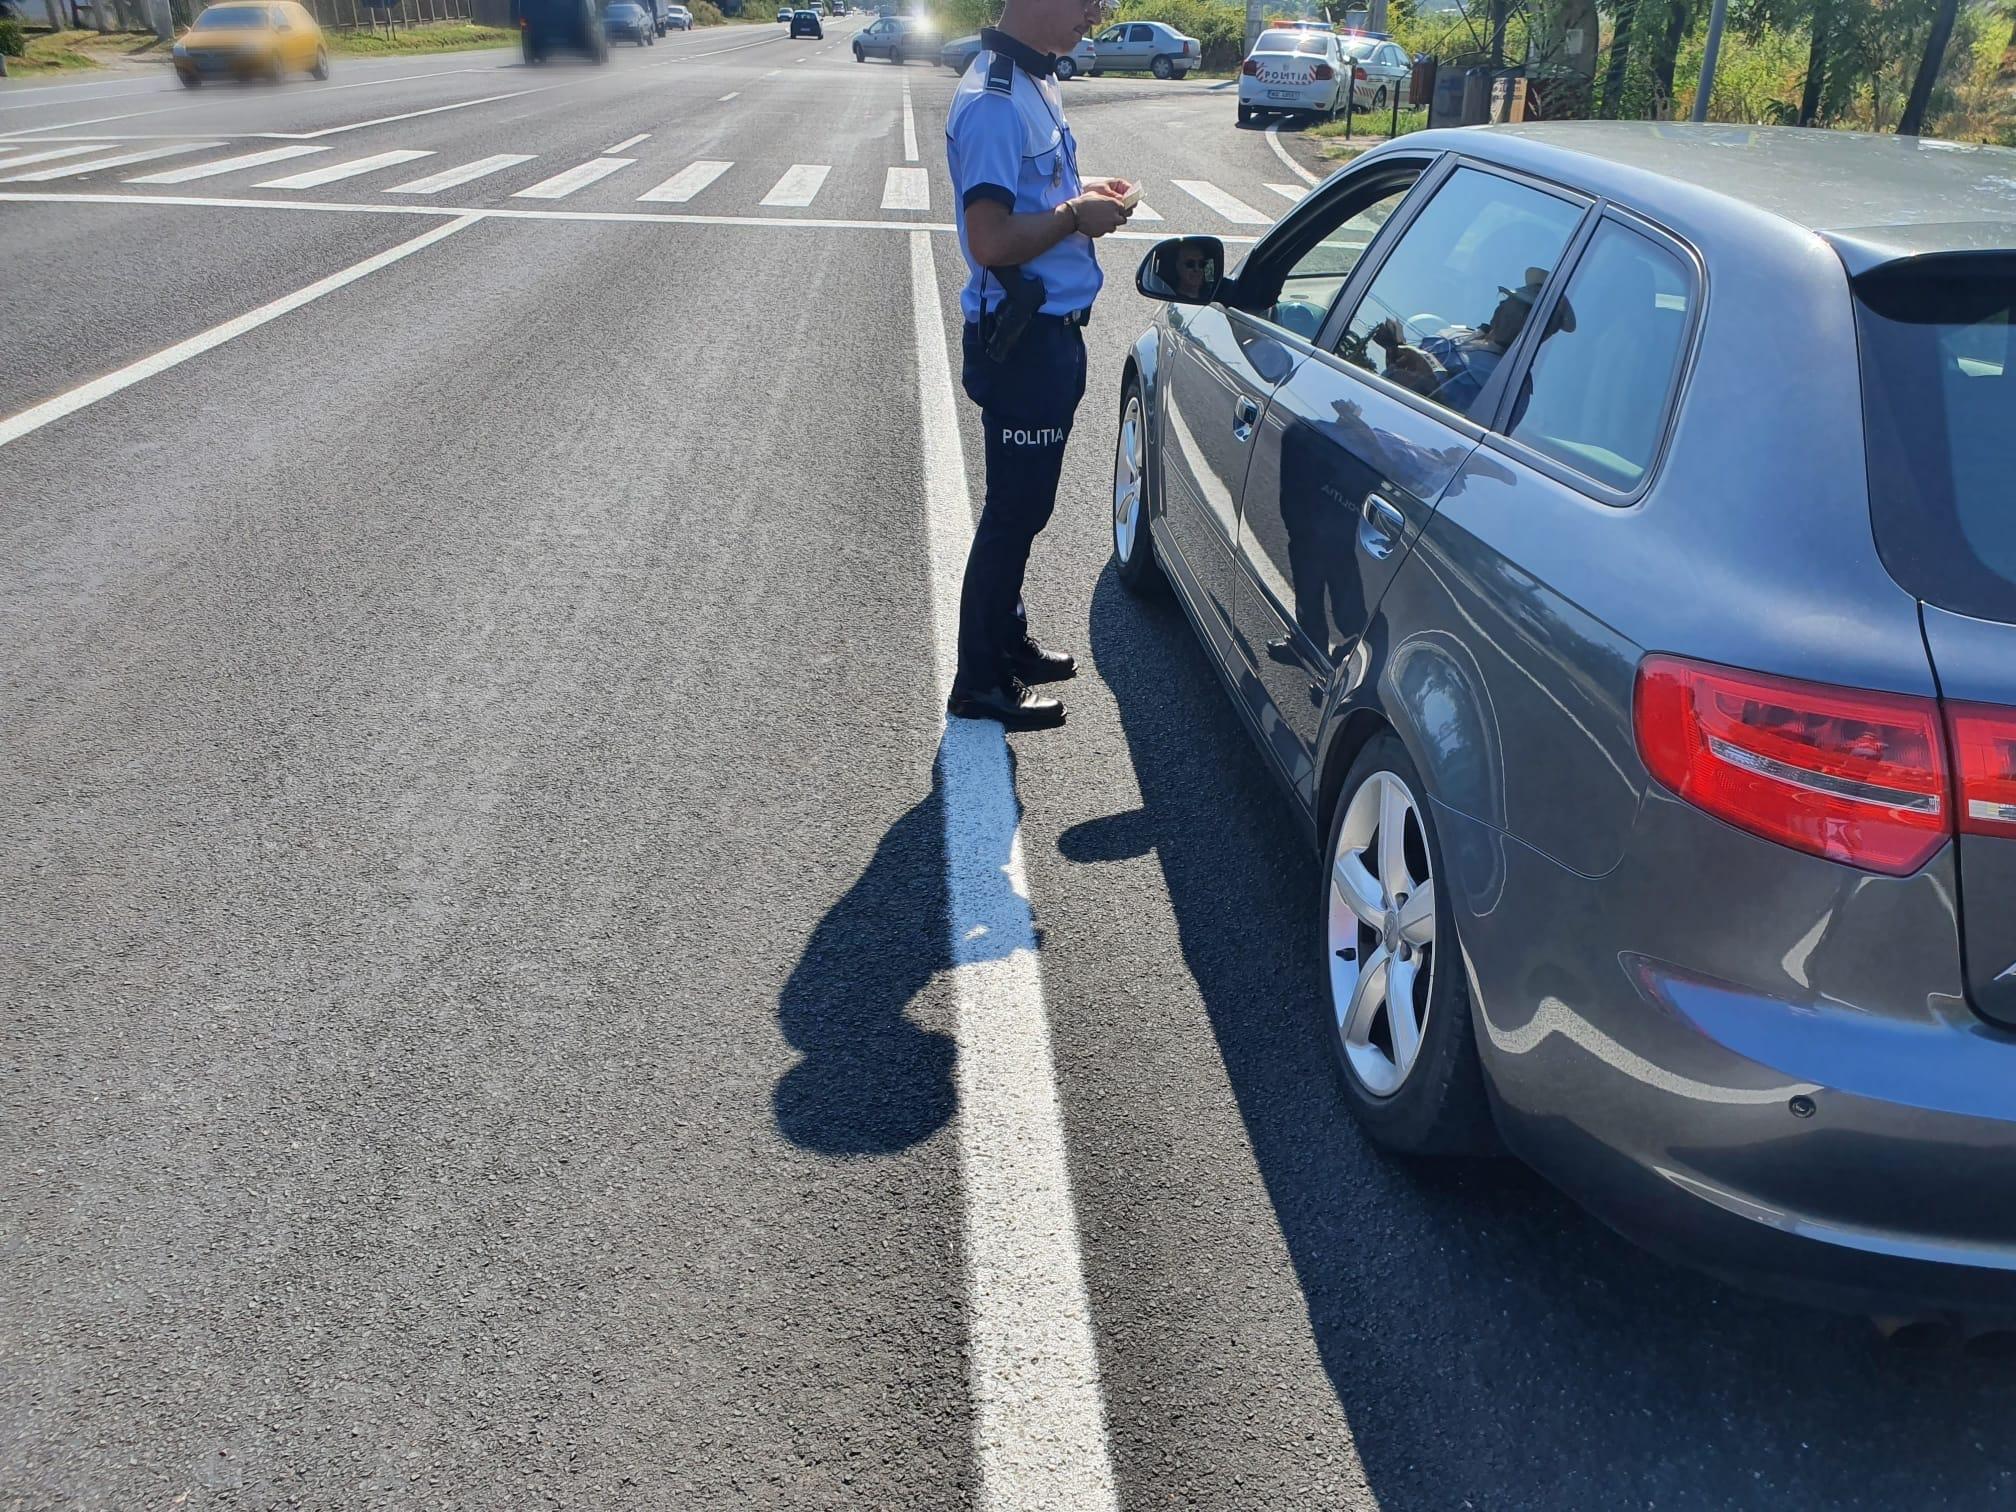 Taximetrist agresiv acuzat de ultraj asupra unui polițist